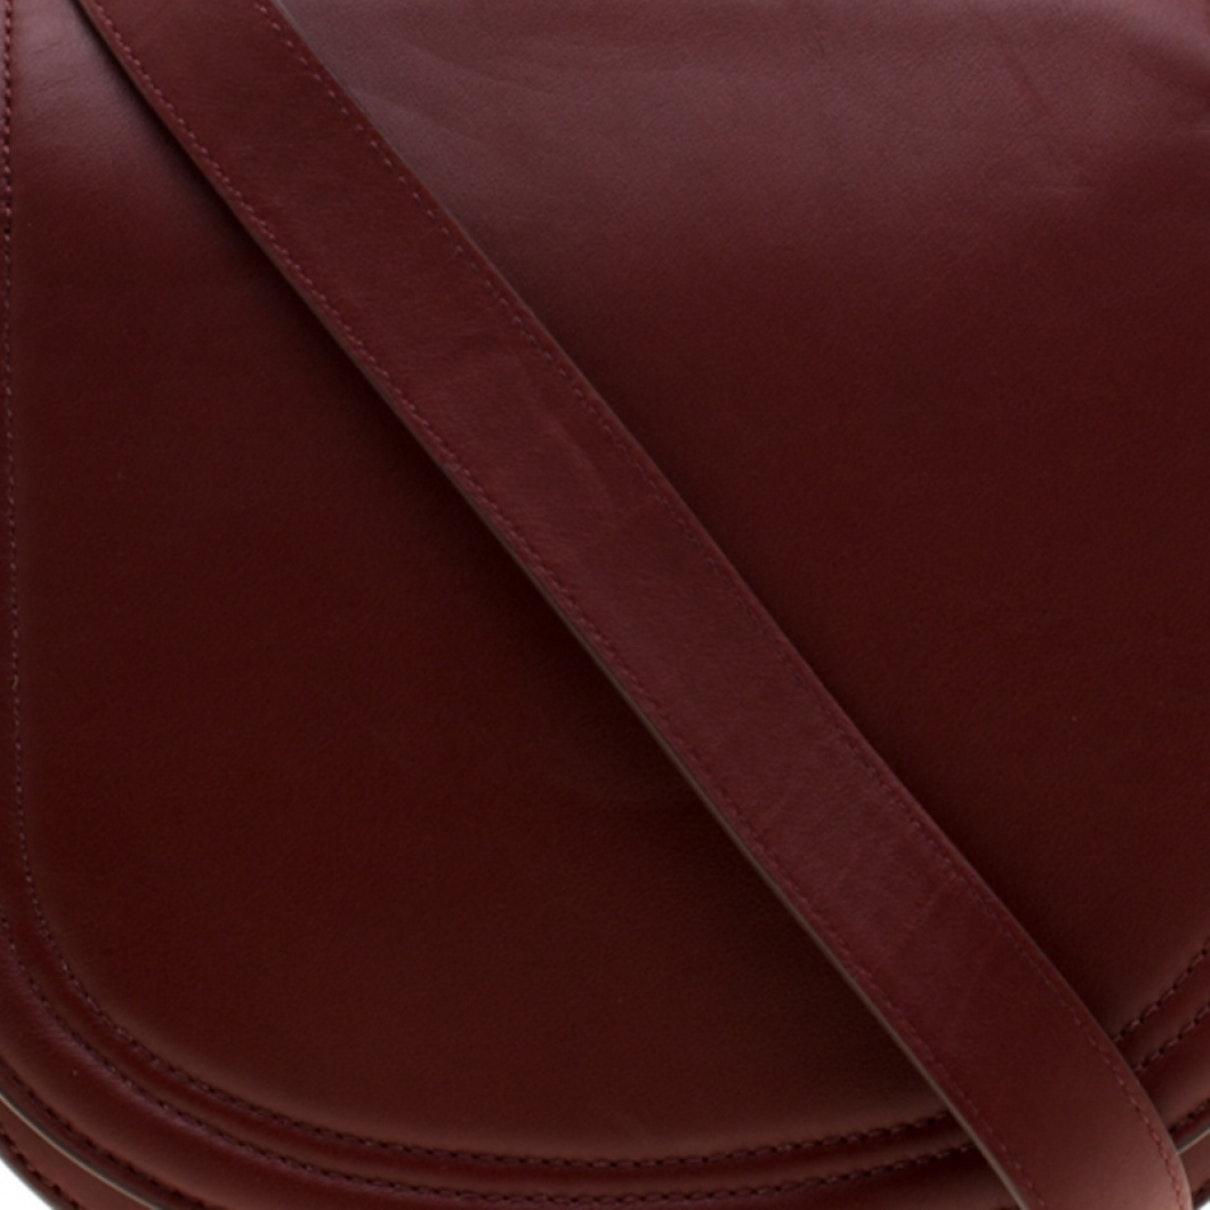 Sac à main en Cuir Rouge Cuir Diane von Furstenberg en coloris Rouge D5rV